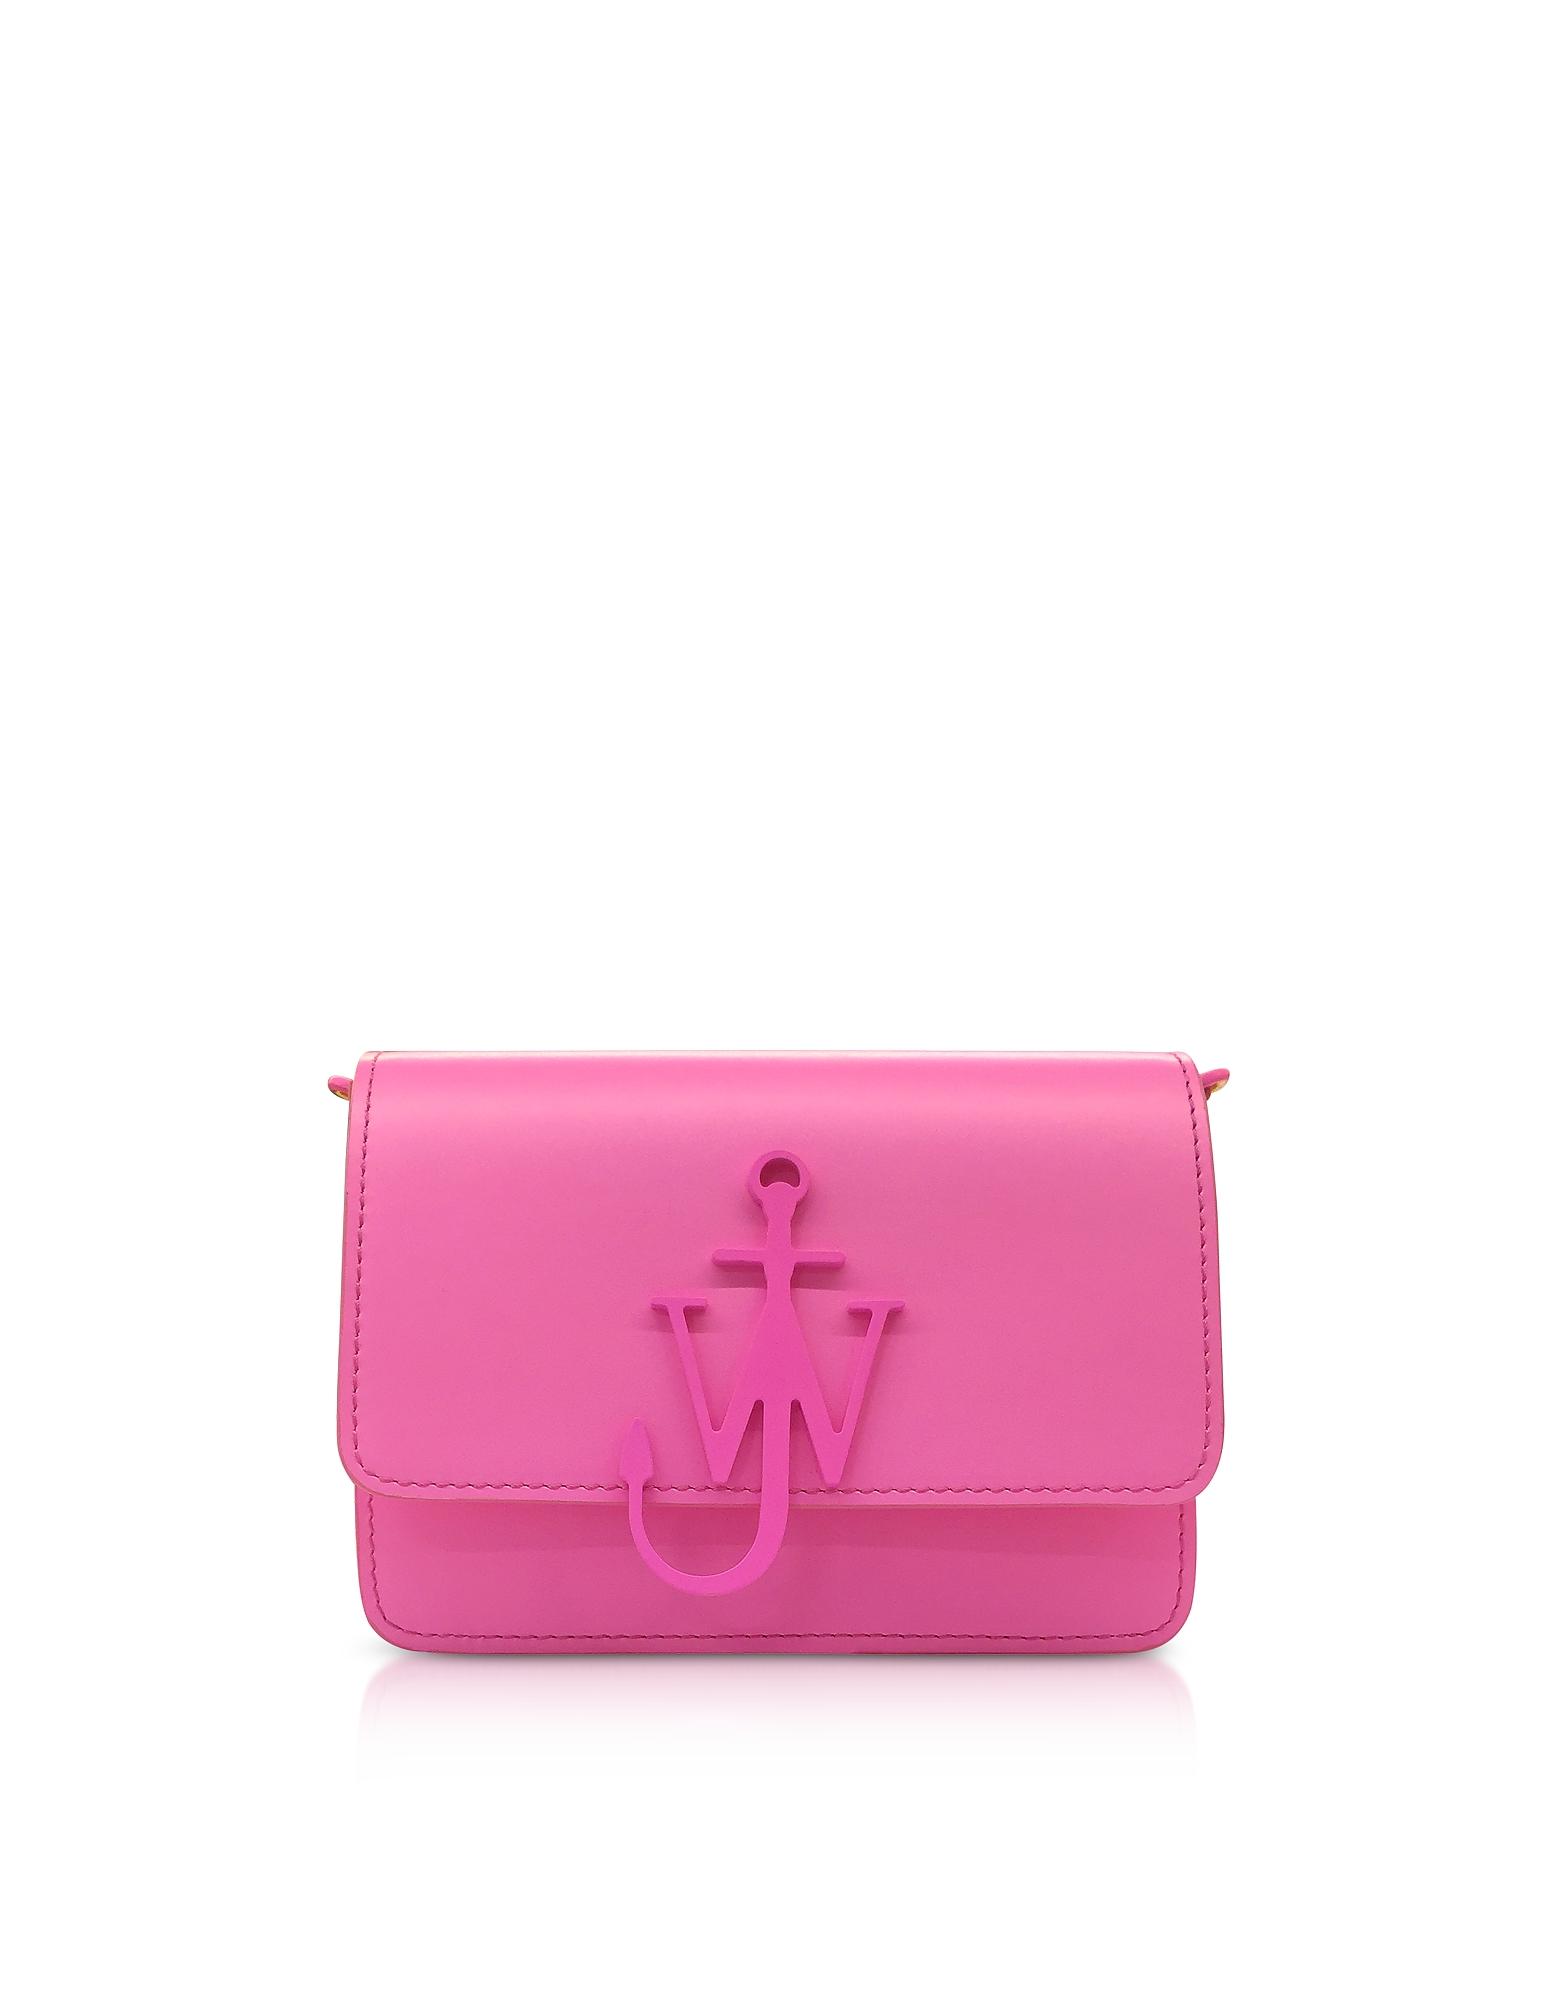 JW Anderson Handbags, New Mini Logo Purse w/Shoulder Strap